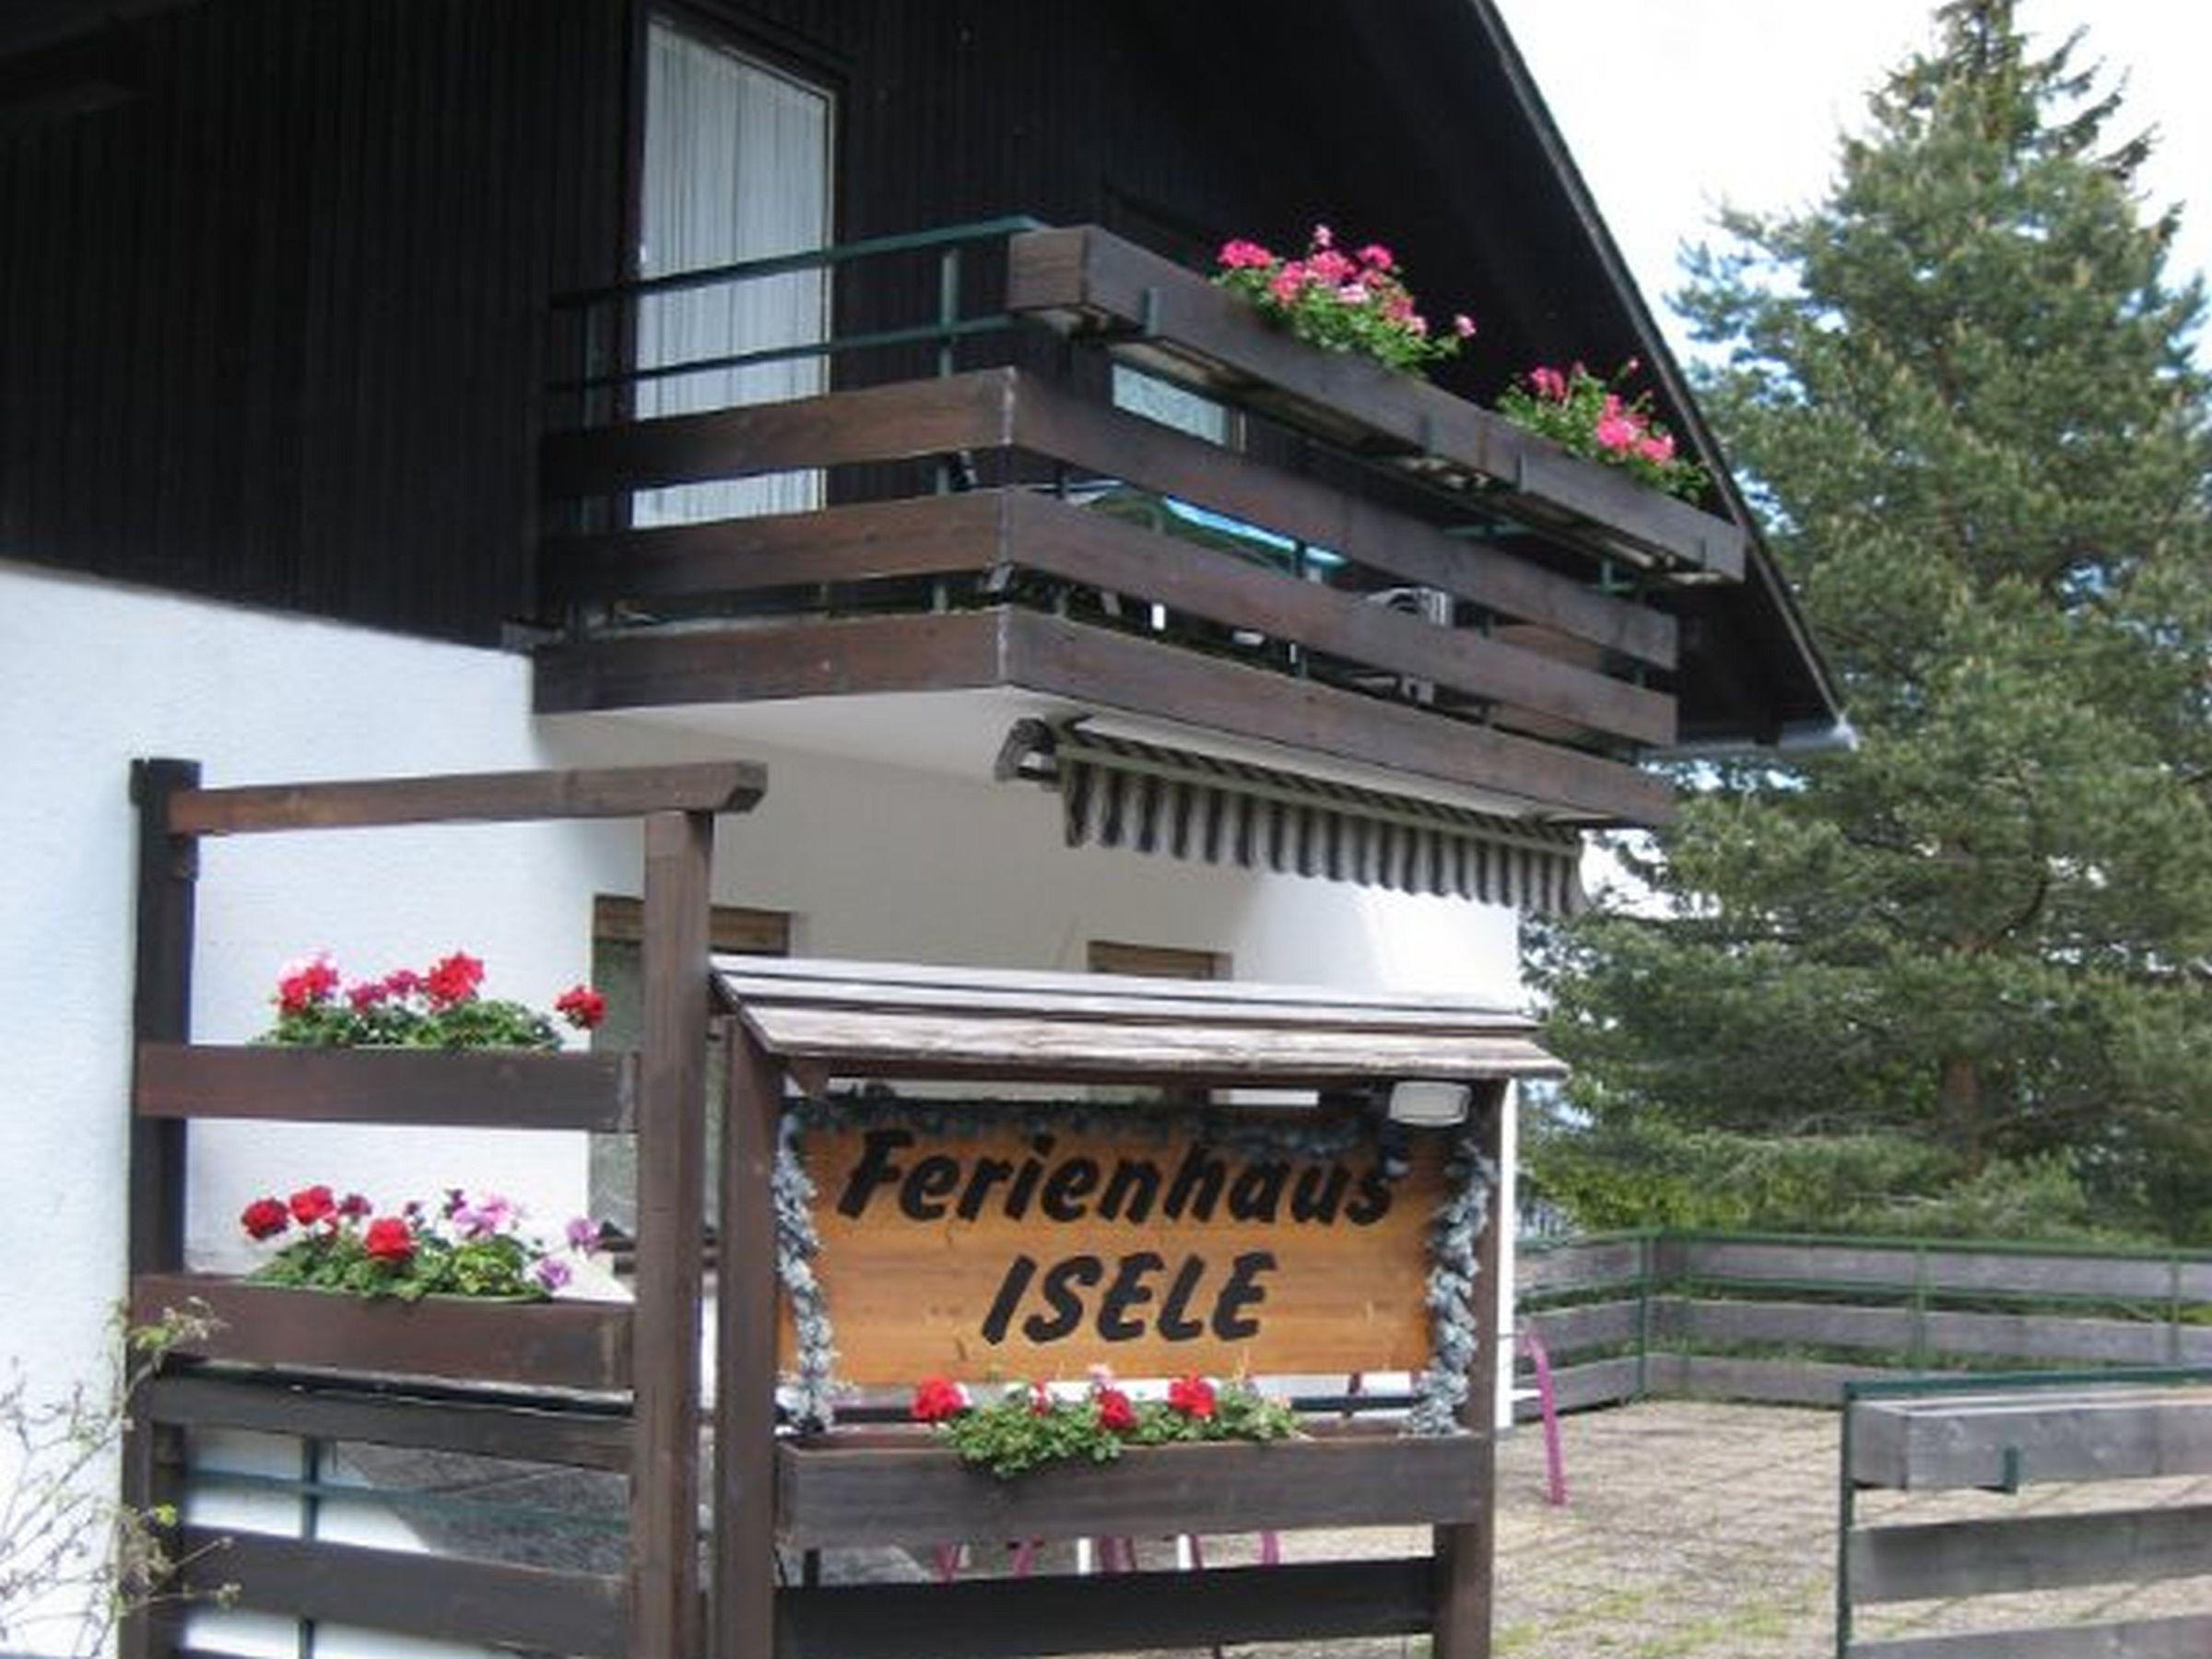 Ferienhaus Isele, (Feldberg-Neuglashütten). F Ferienwohnung  Schwarzwald